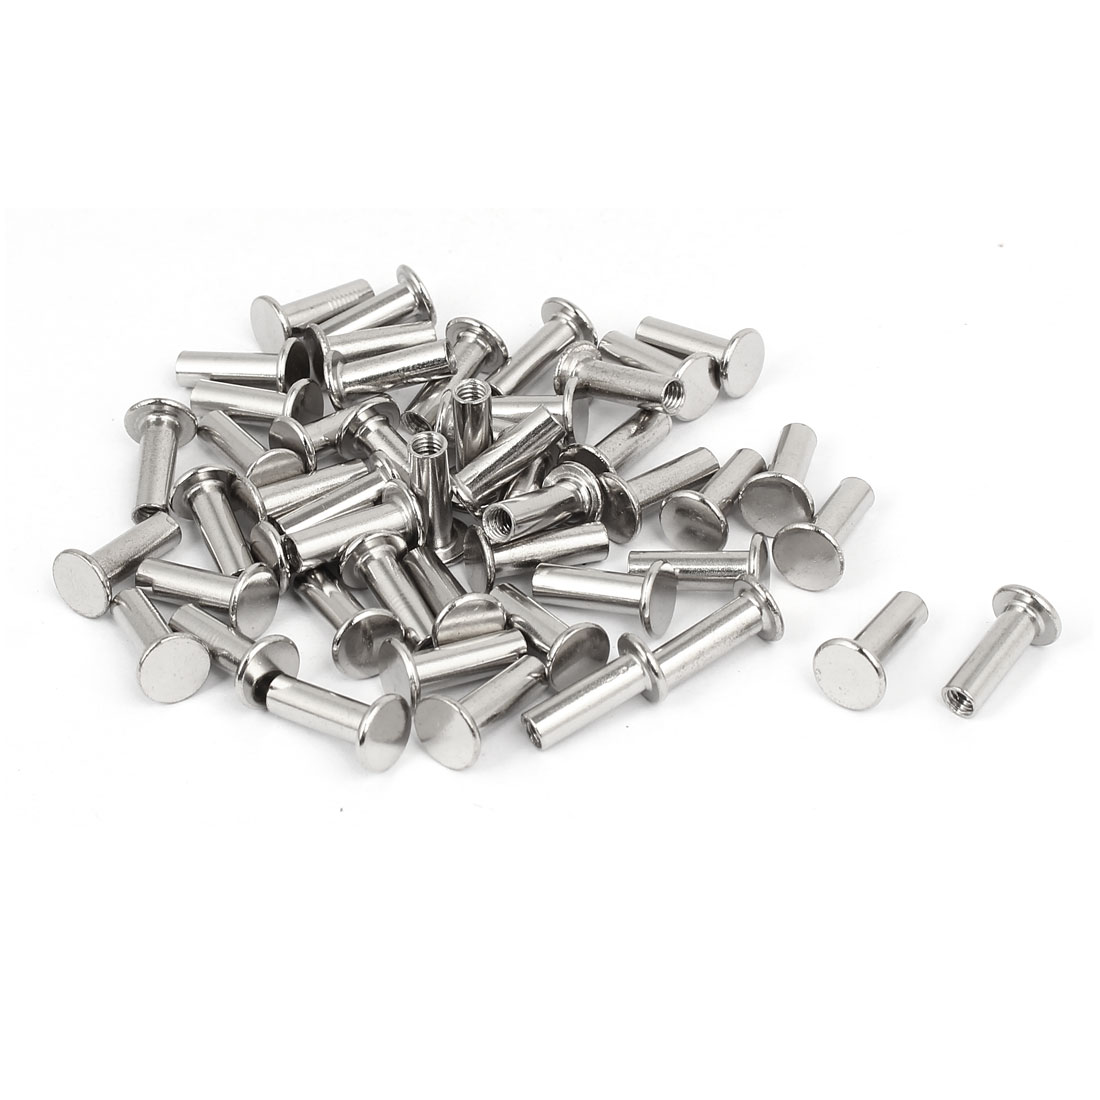 Album Metal Nickel Plated Binding Screw Post Nut 5mmx18mm 50pcs